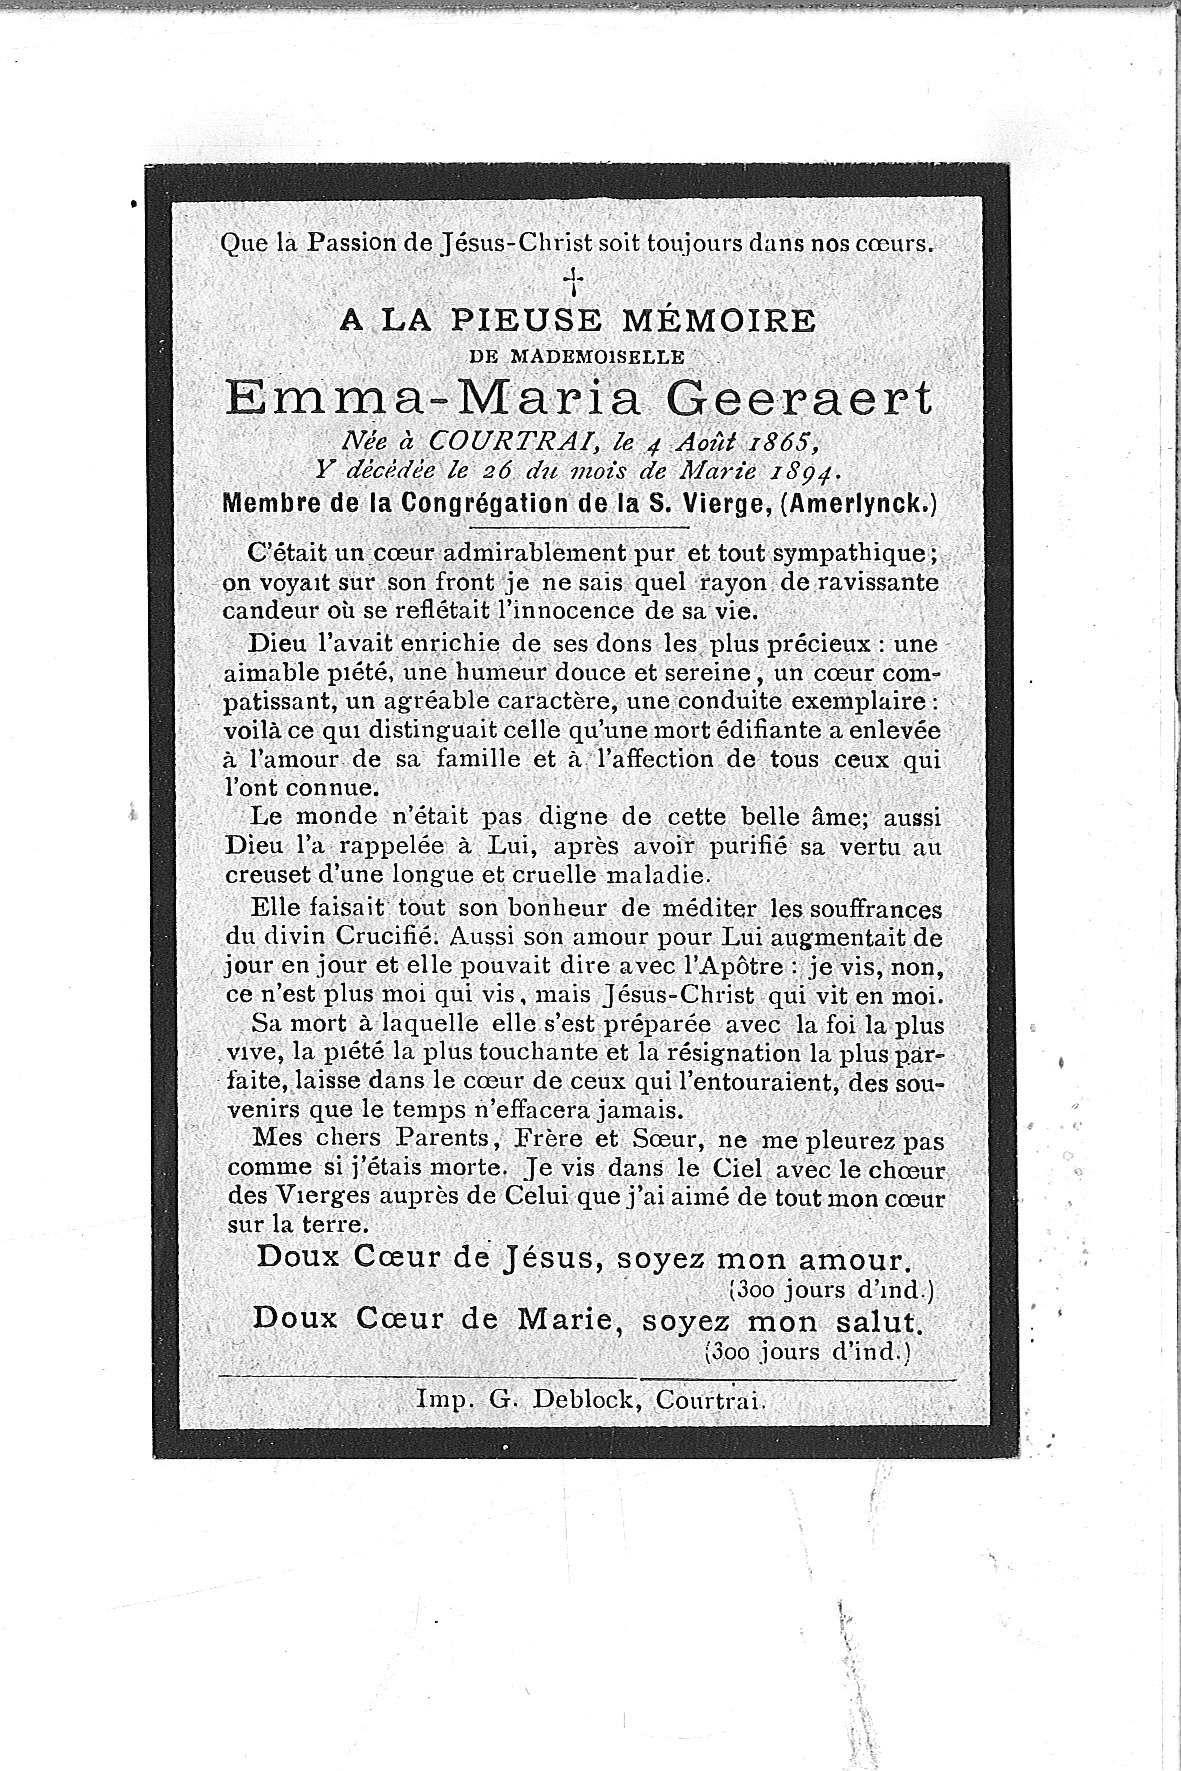 Emma-Maria(1894)20130820085803_00009.jpg